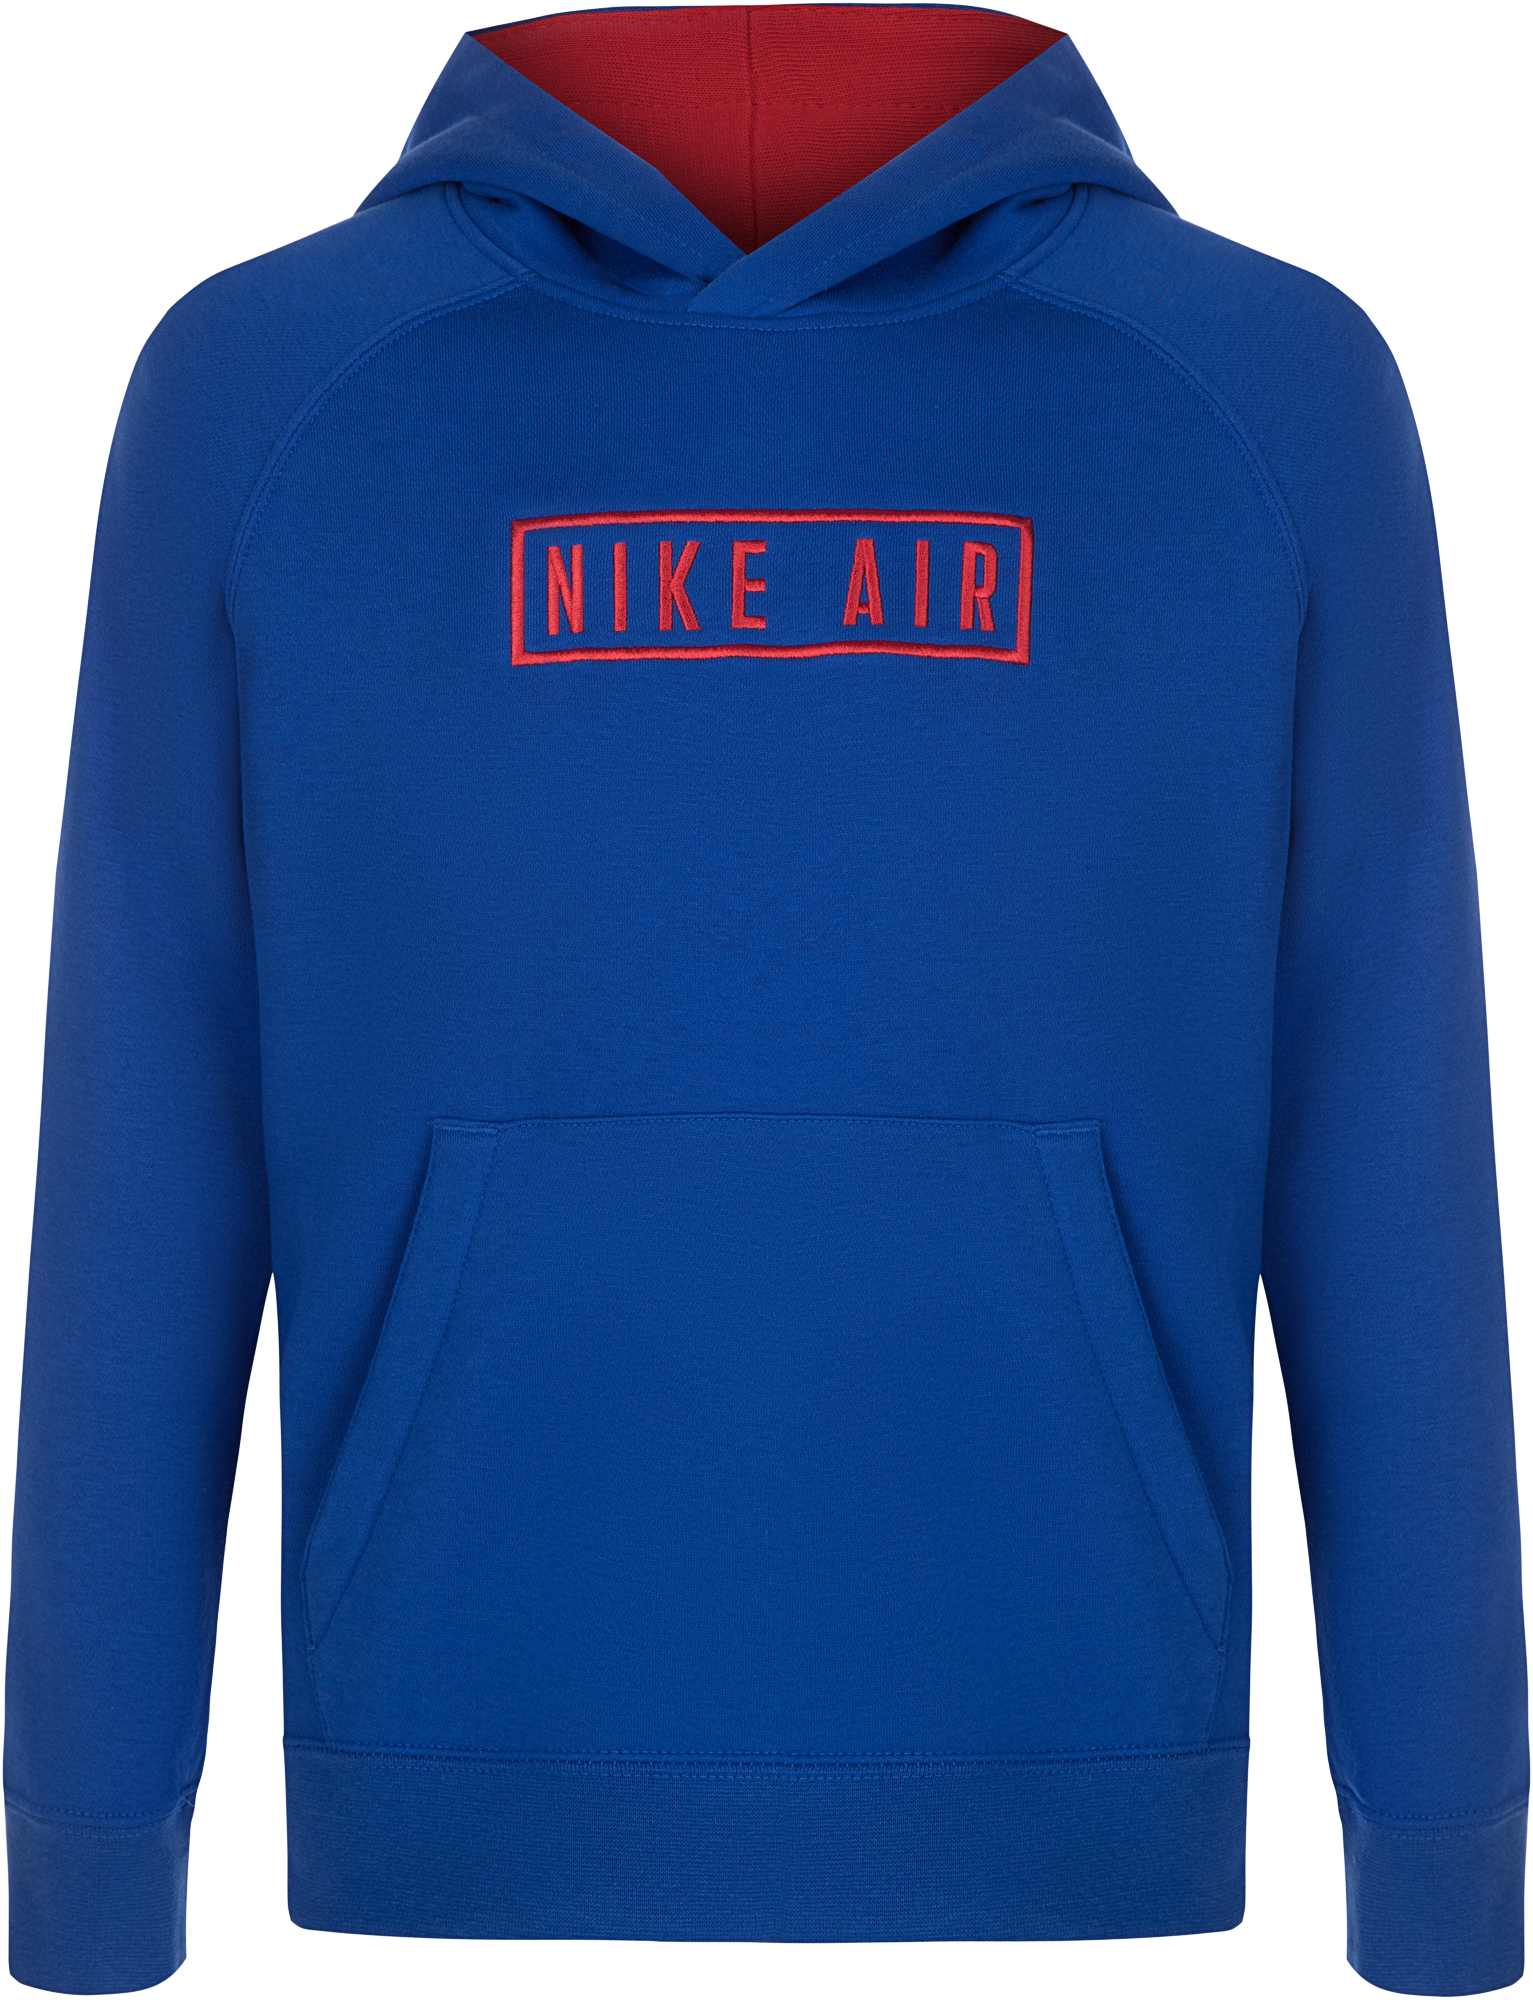 цены на Nike Худи для мальчиков Nike Air, размер 158-170 в интернет-магазинах